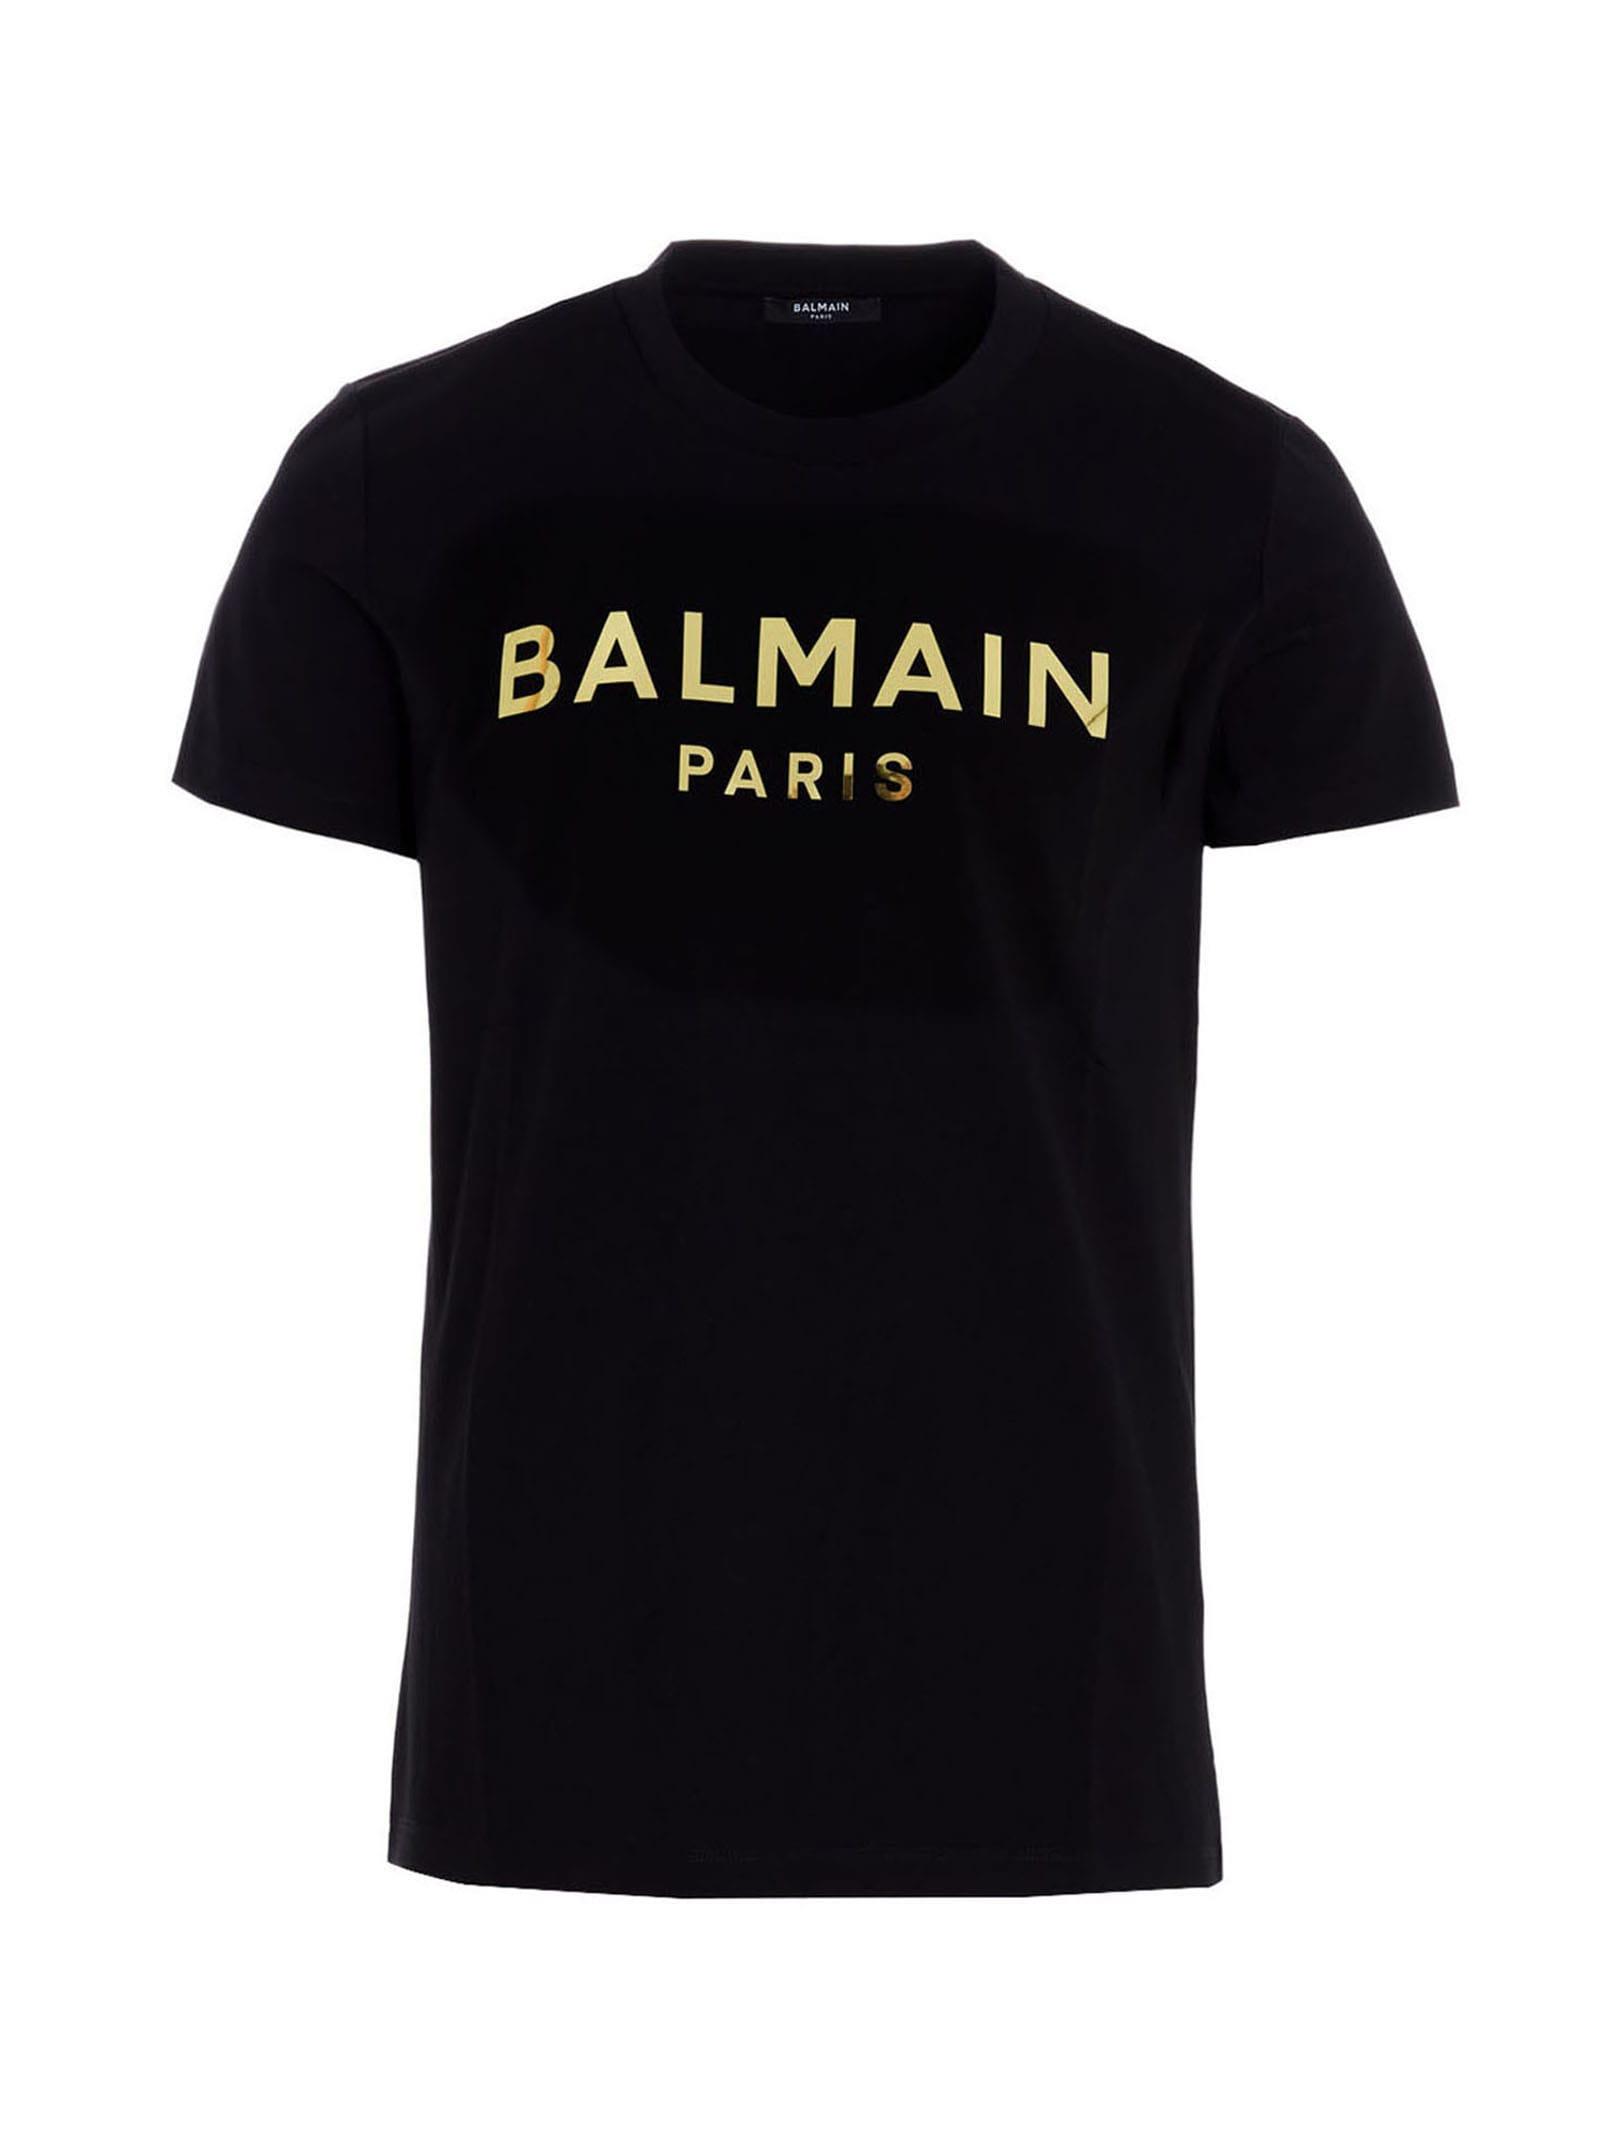 BALMAIN BALMAIN FOIL TS T-SHIRT